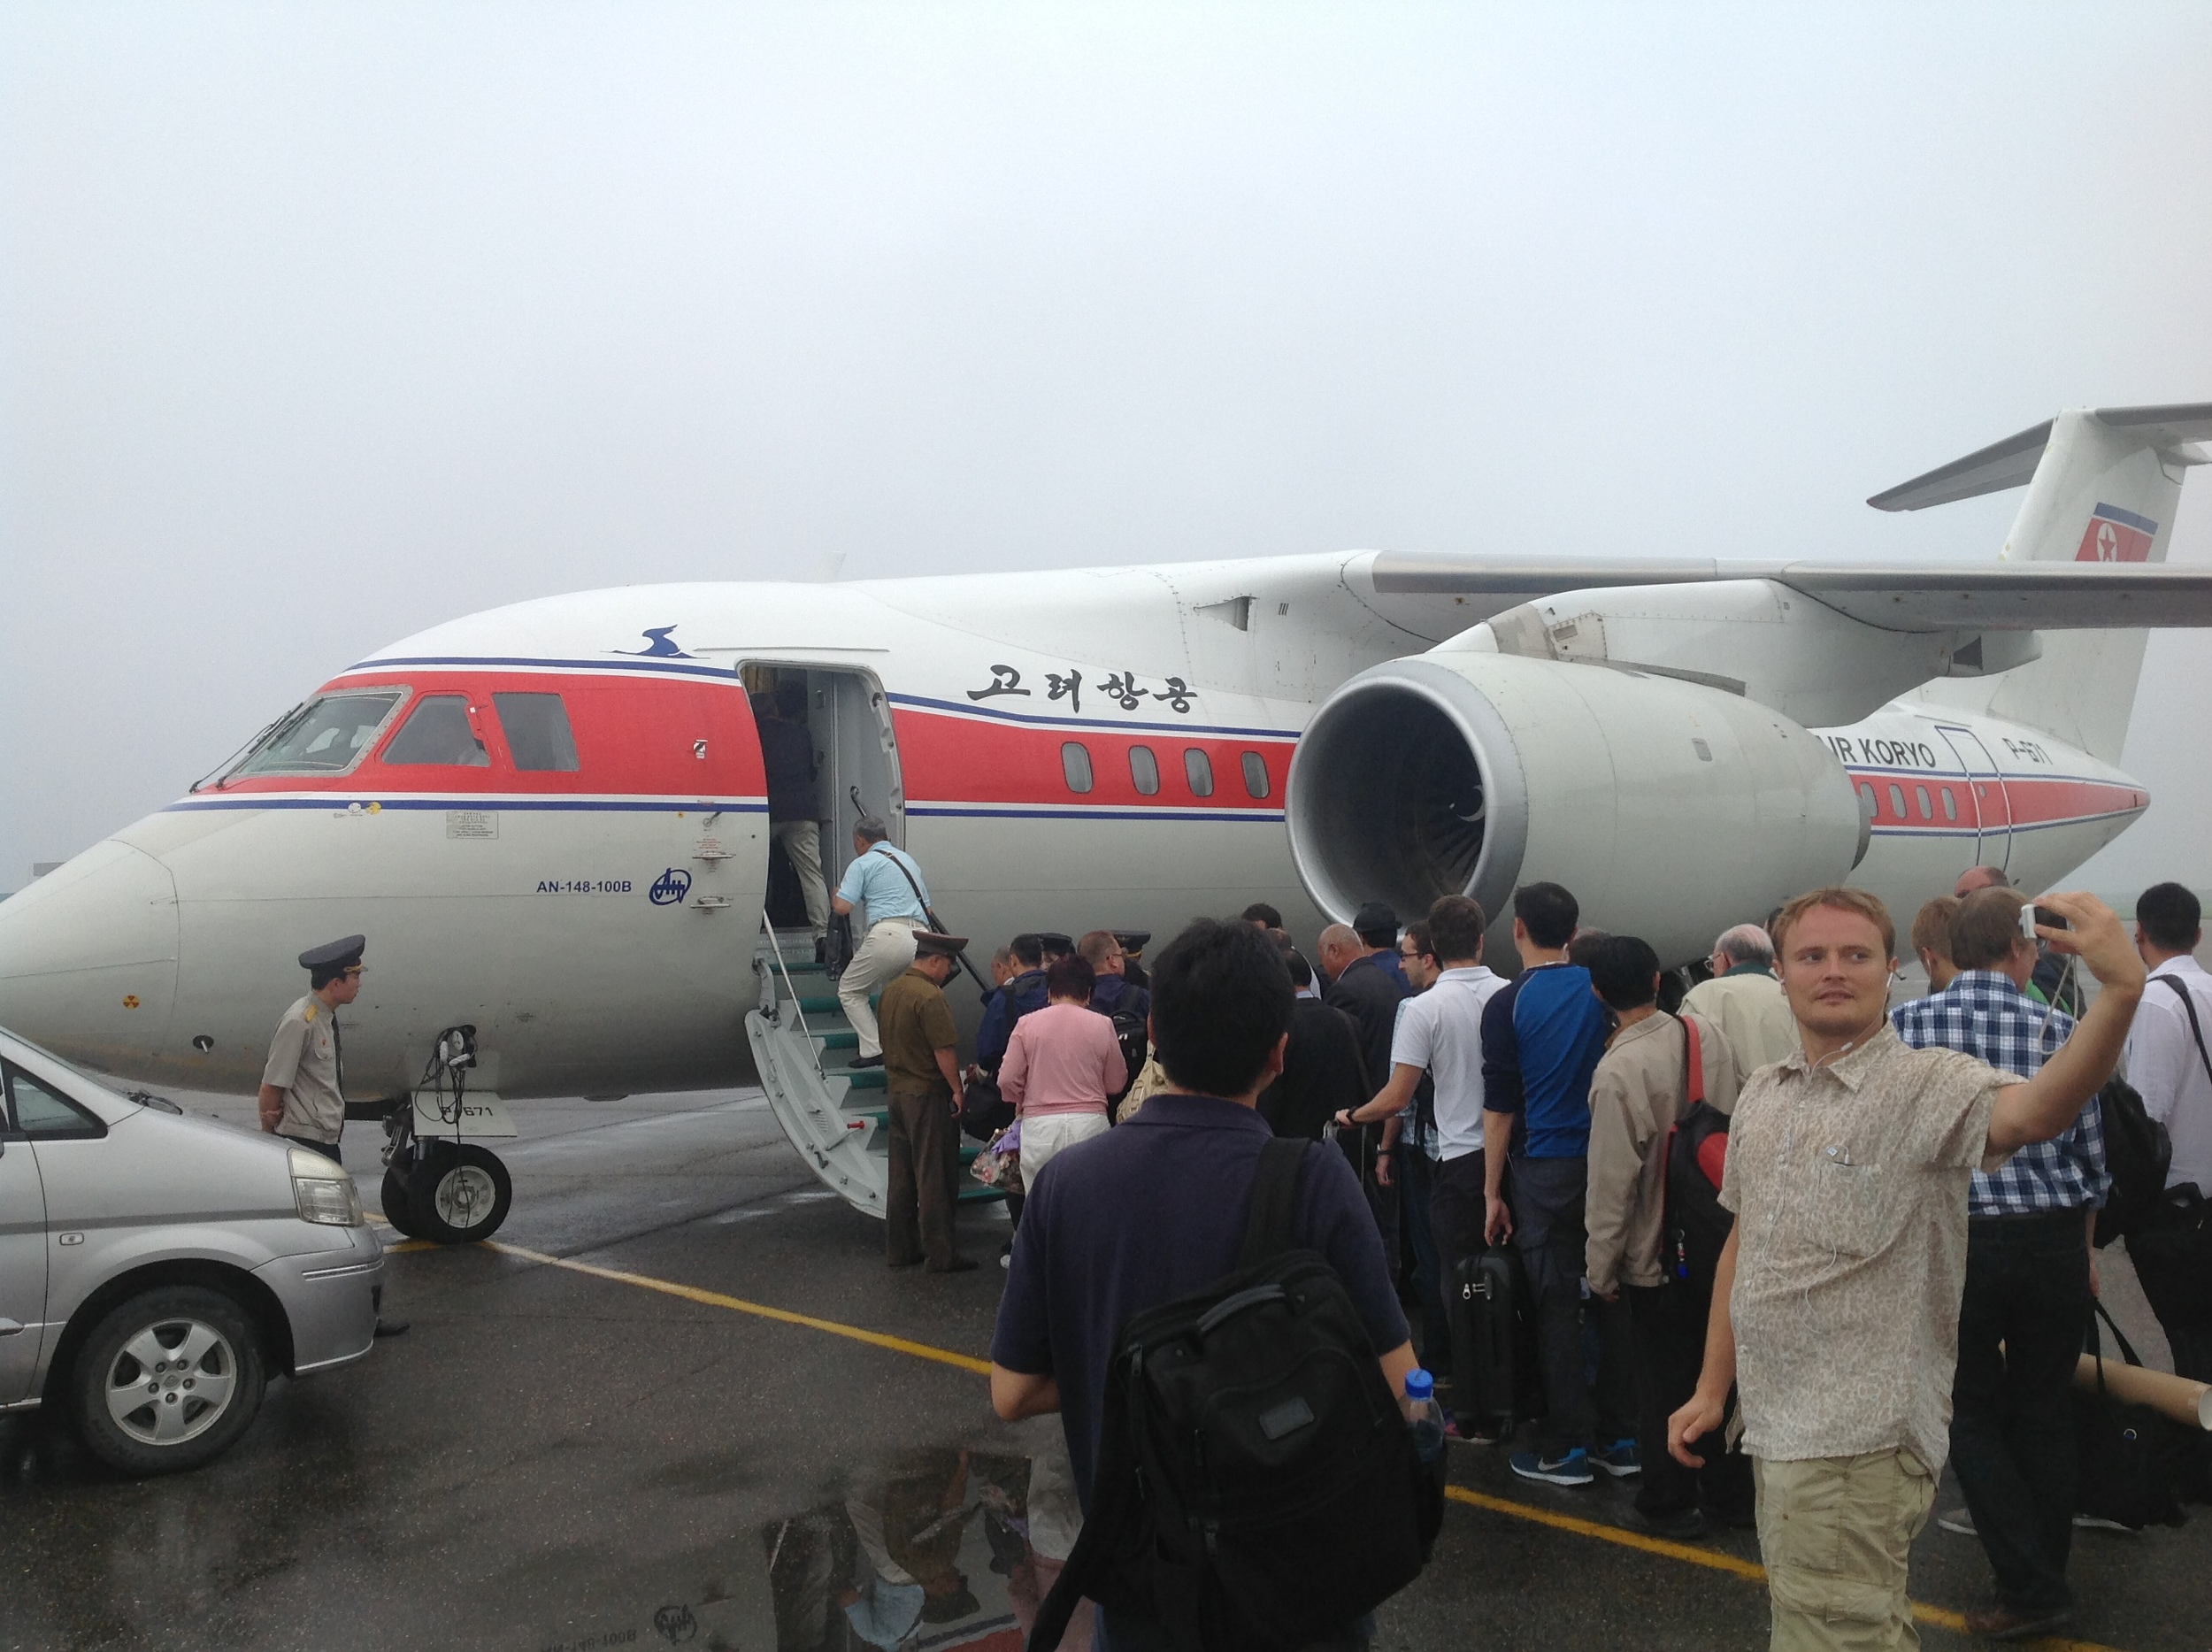 A Russian-made Antonov AN-148 on the tarmac at Sunan International Airport on a rainy day